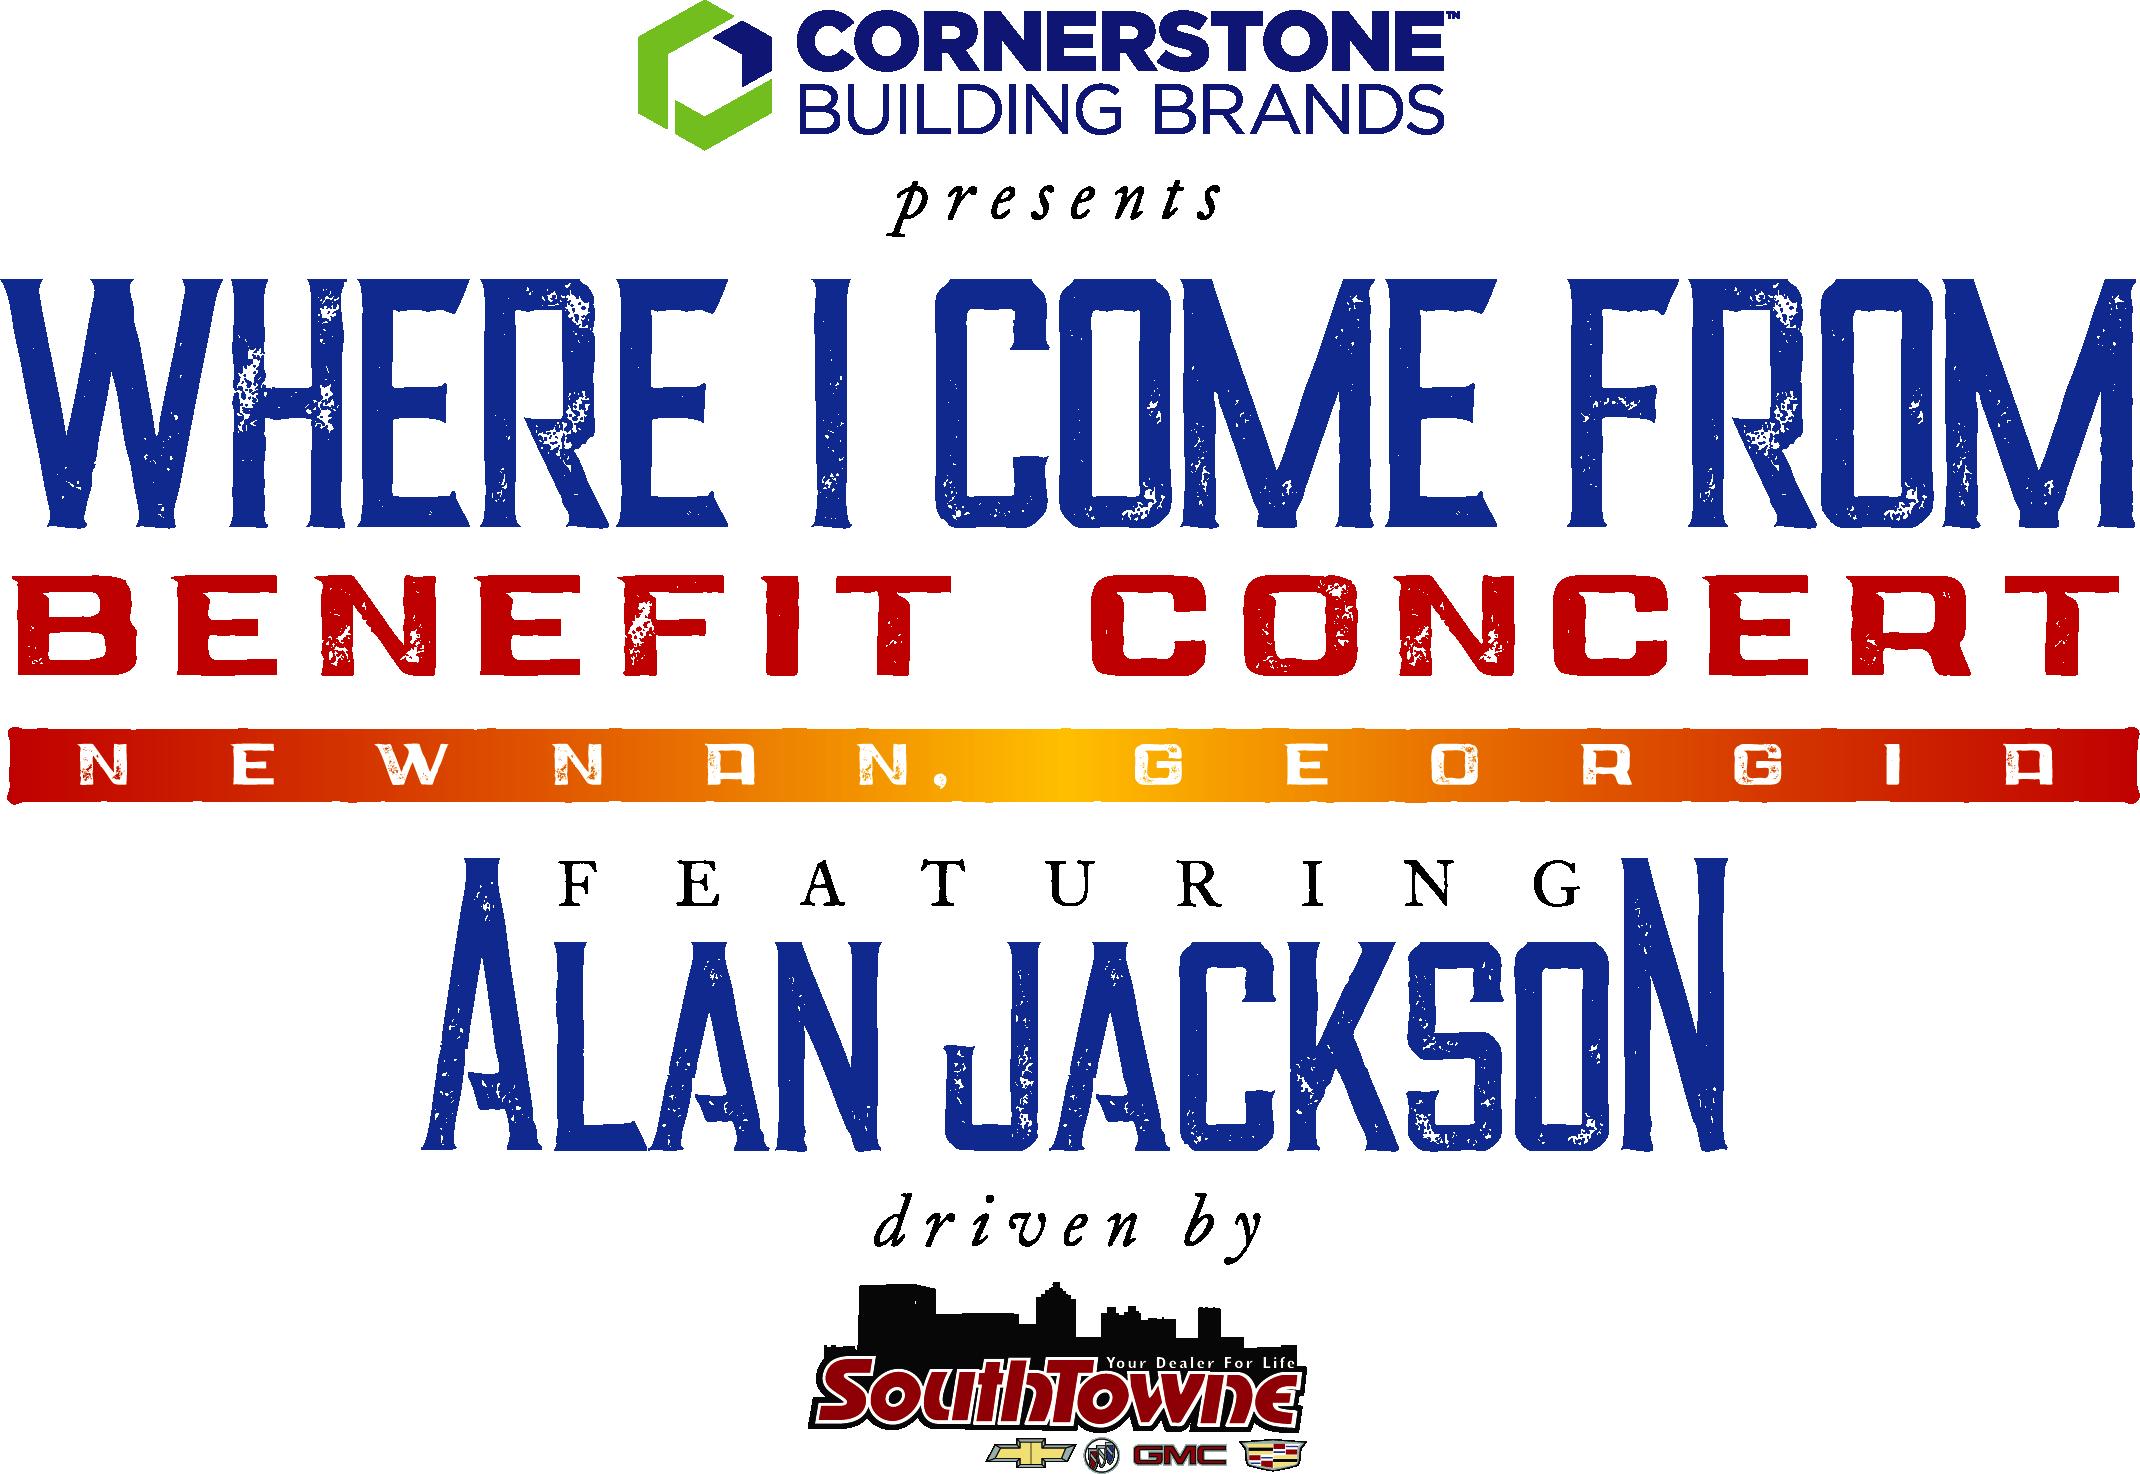 Alan Jackson Newnan Benefit